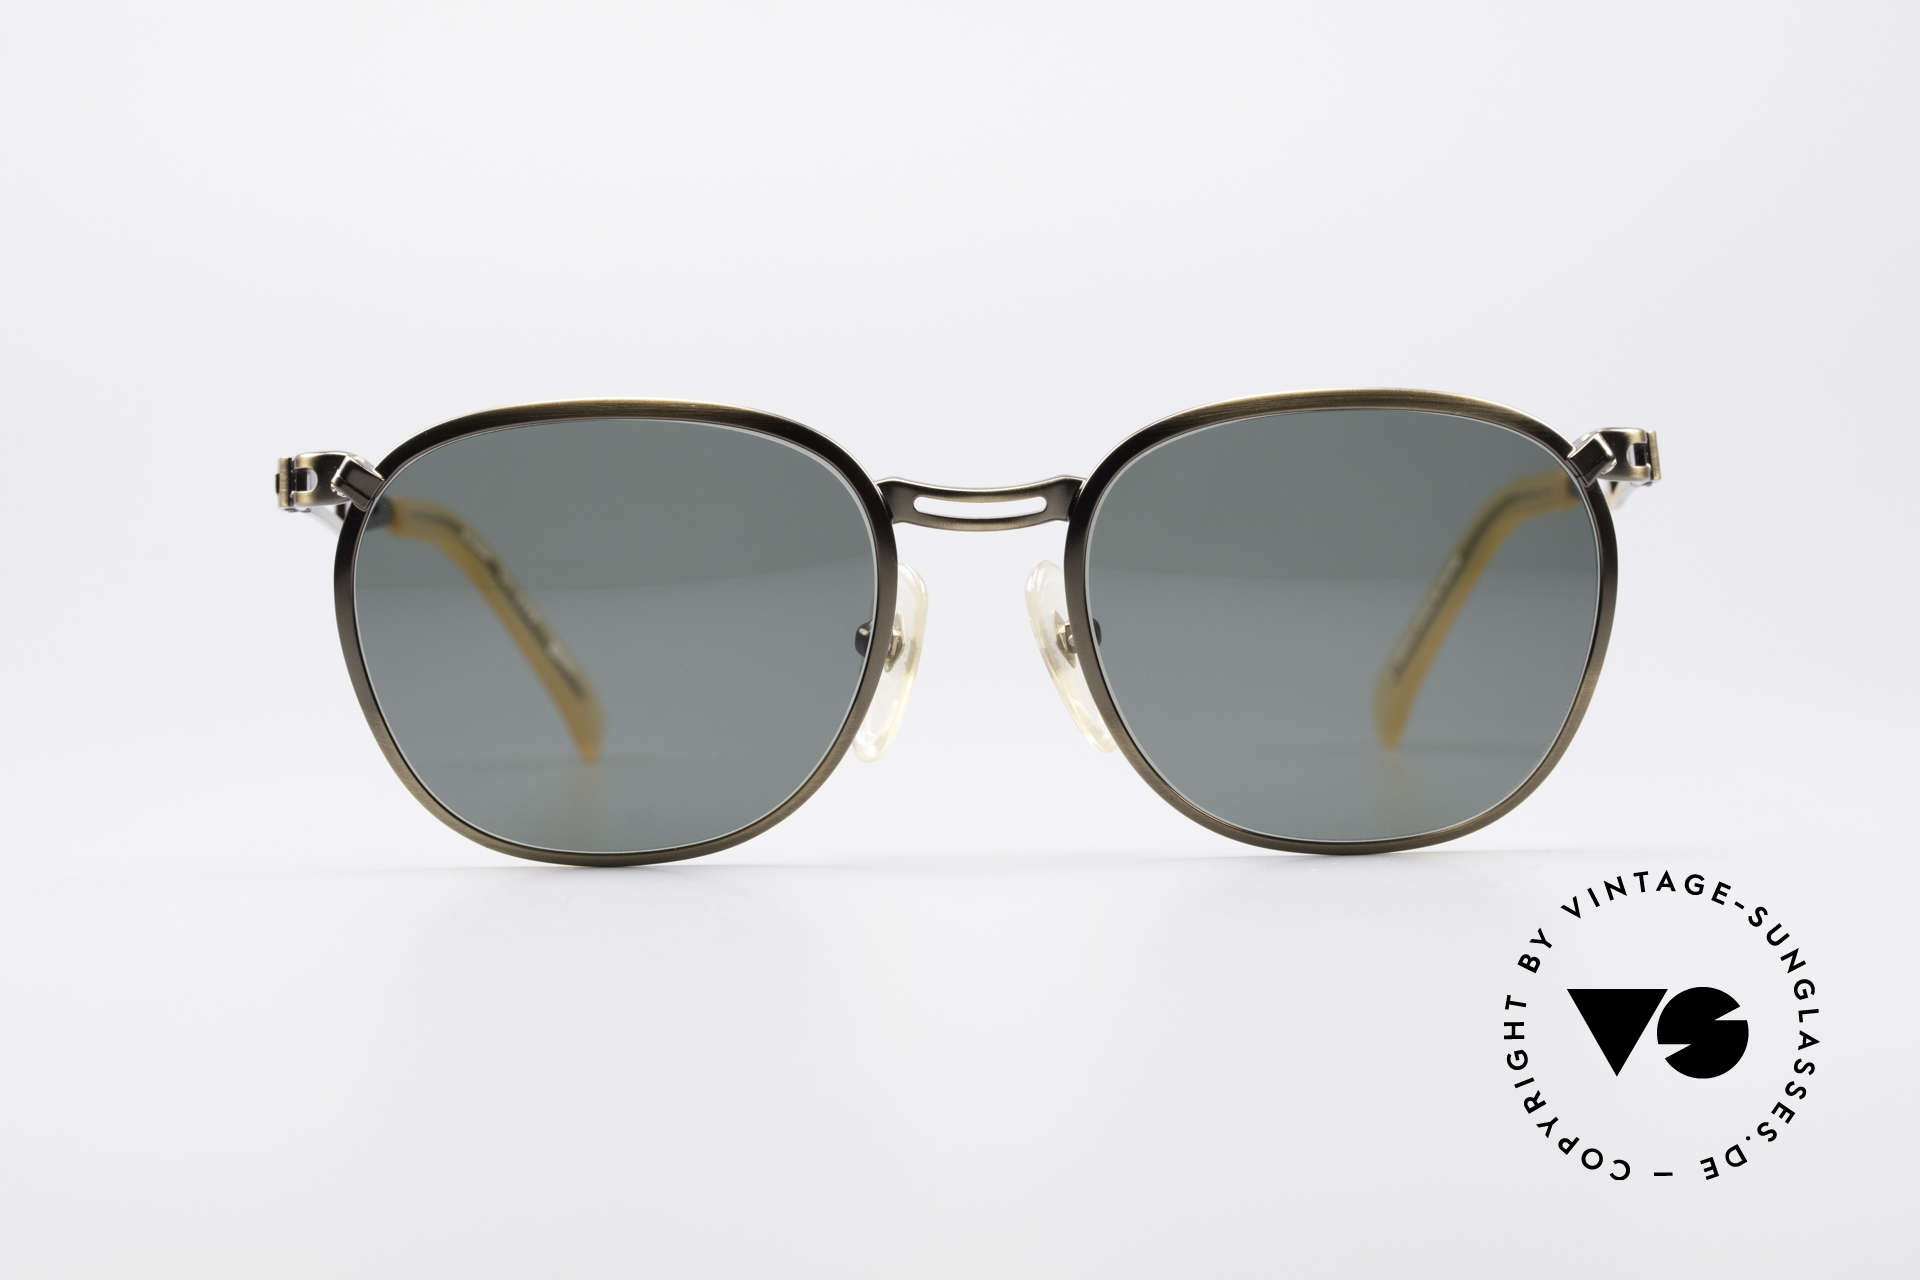 Jean Paul Gaultier 56-2177 90's Designer Sunglasses, unusual discreet design by eccentric J.P. Gaultier, Made for Men and Women